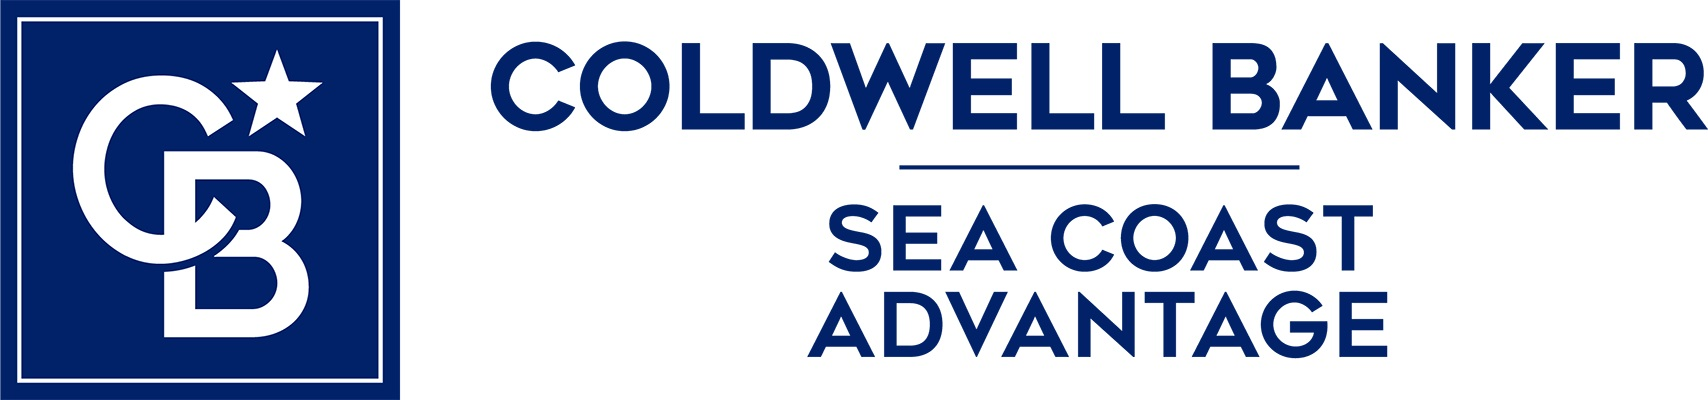 Kimberly Sands - Coldwell Banker Sea Coast Advantage Realty Logo